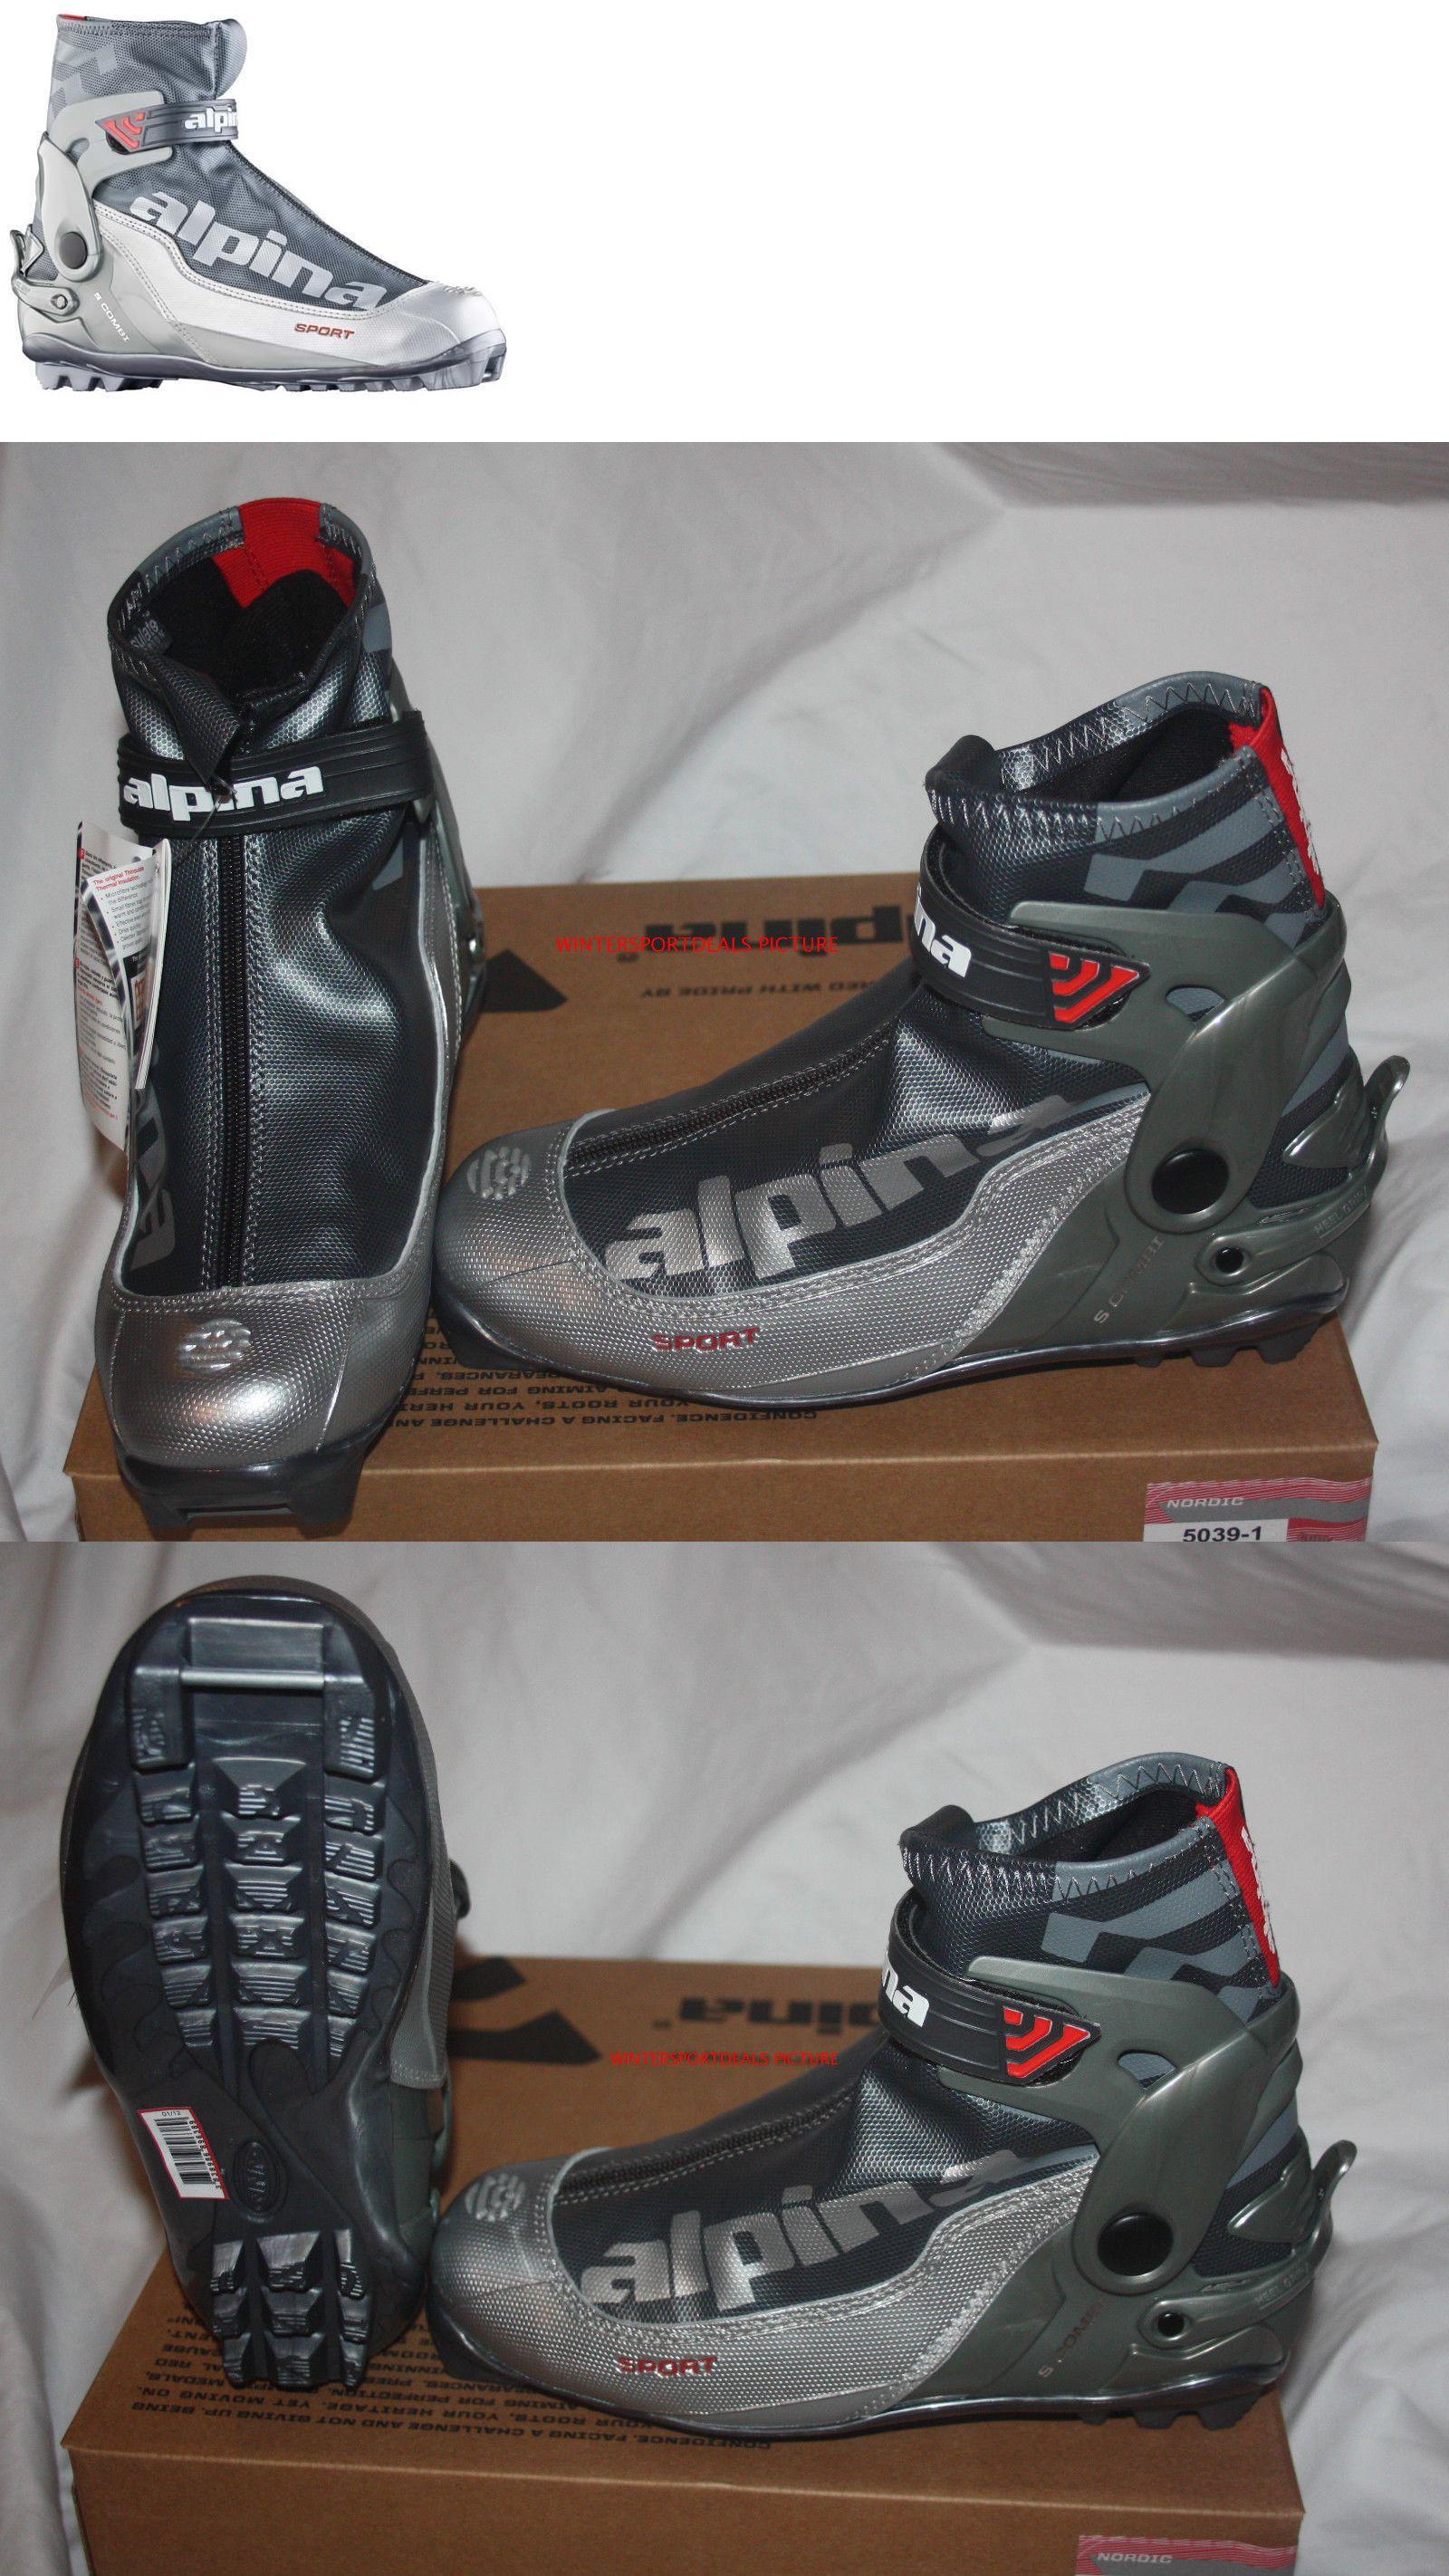 Alpina S Combi Sport Series CrossCountry Nordic Ski Boots Silver - Alpina combi boots